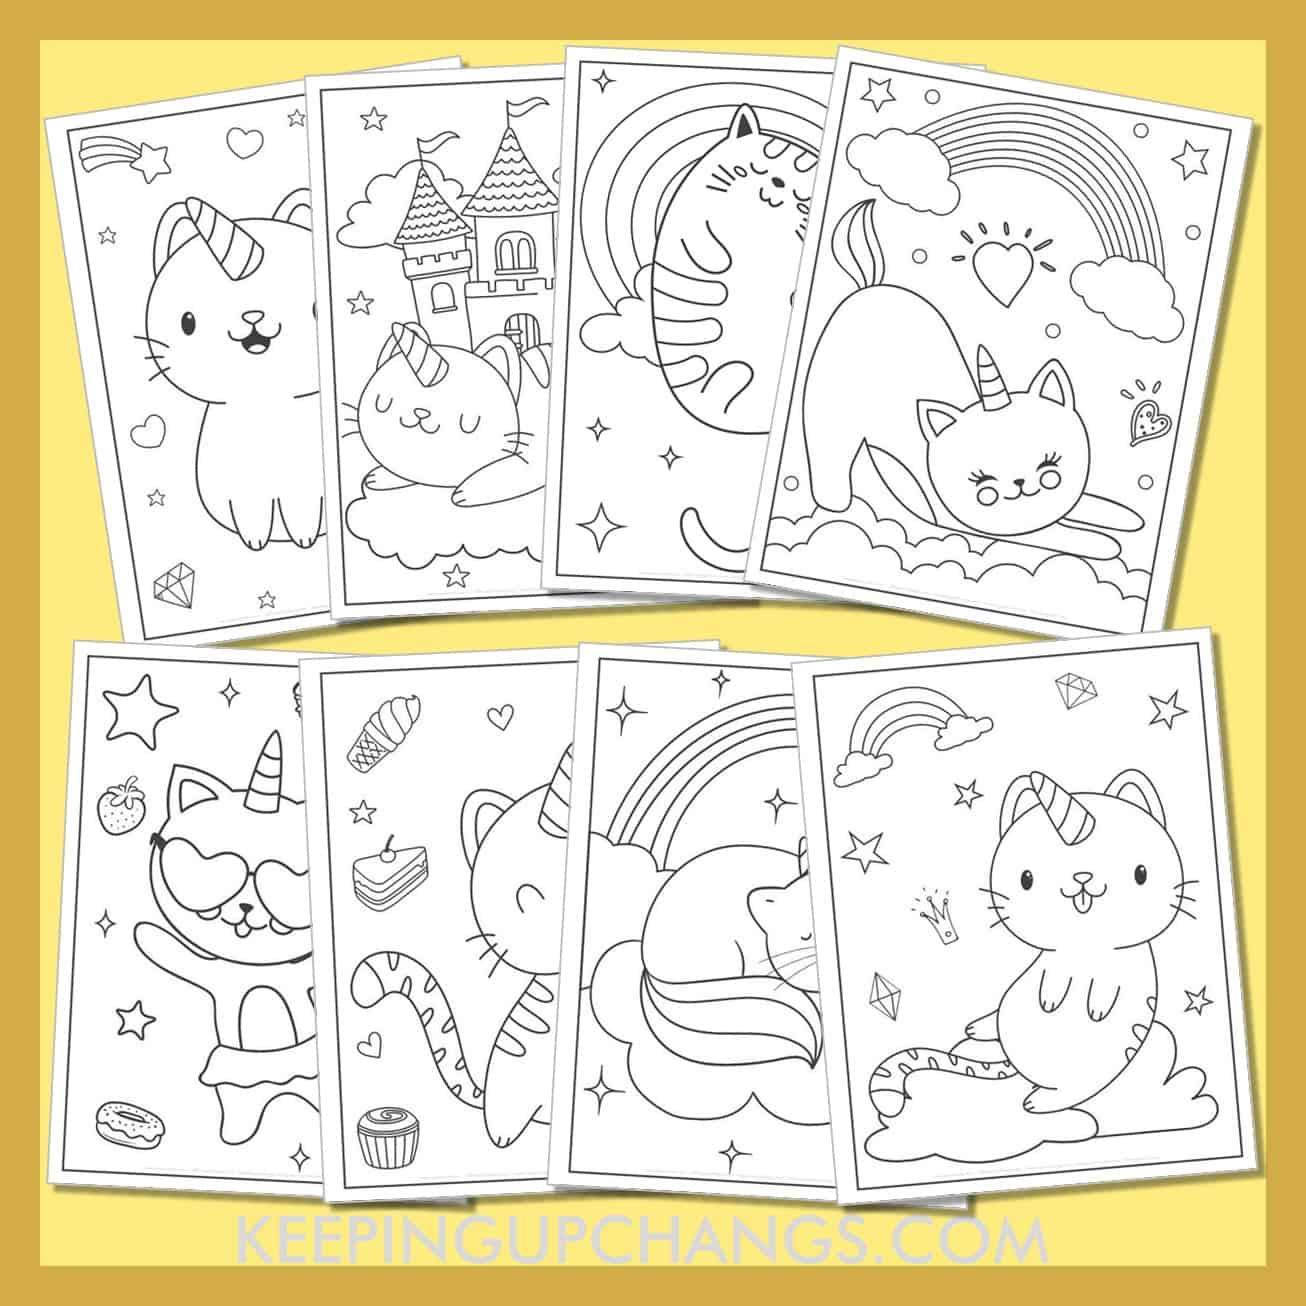 cat unicorn colouring sheets including cute, adorable caticorns like mermaid, ballerina rock star, and princess.